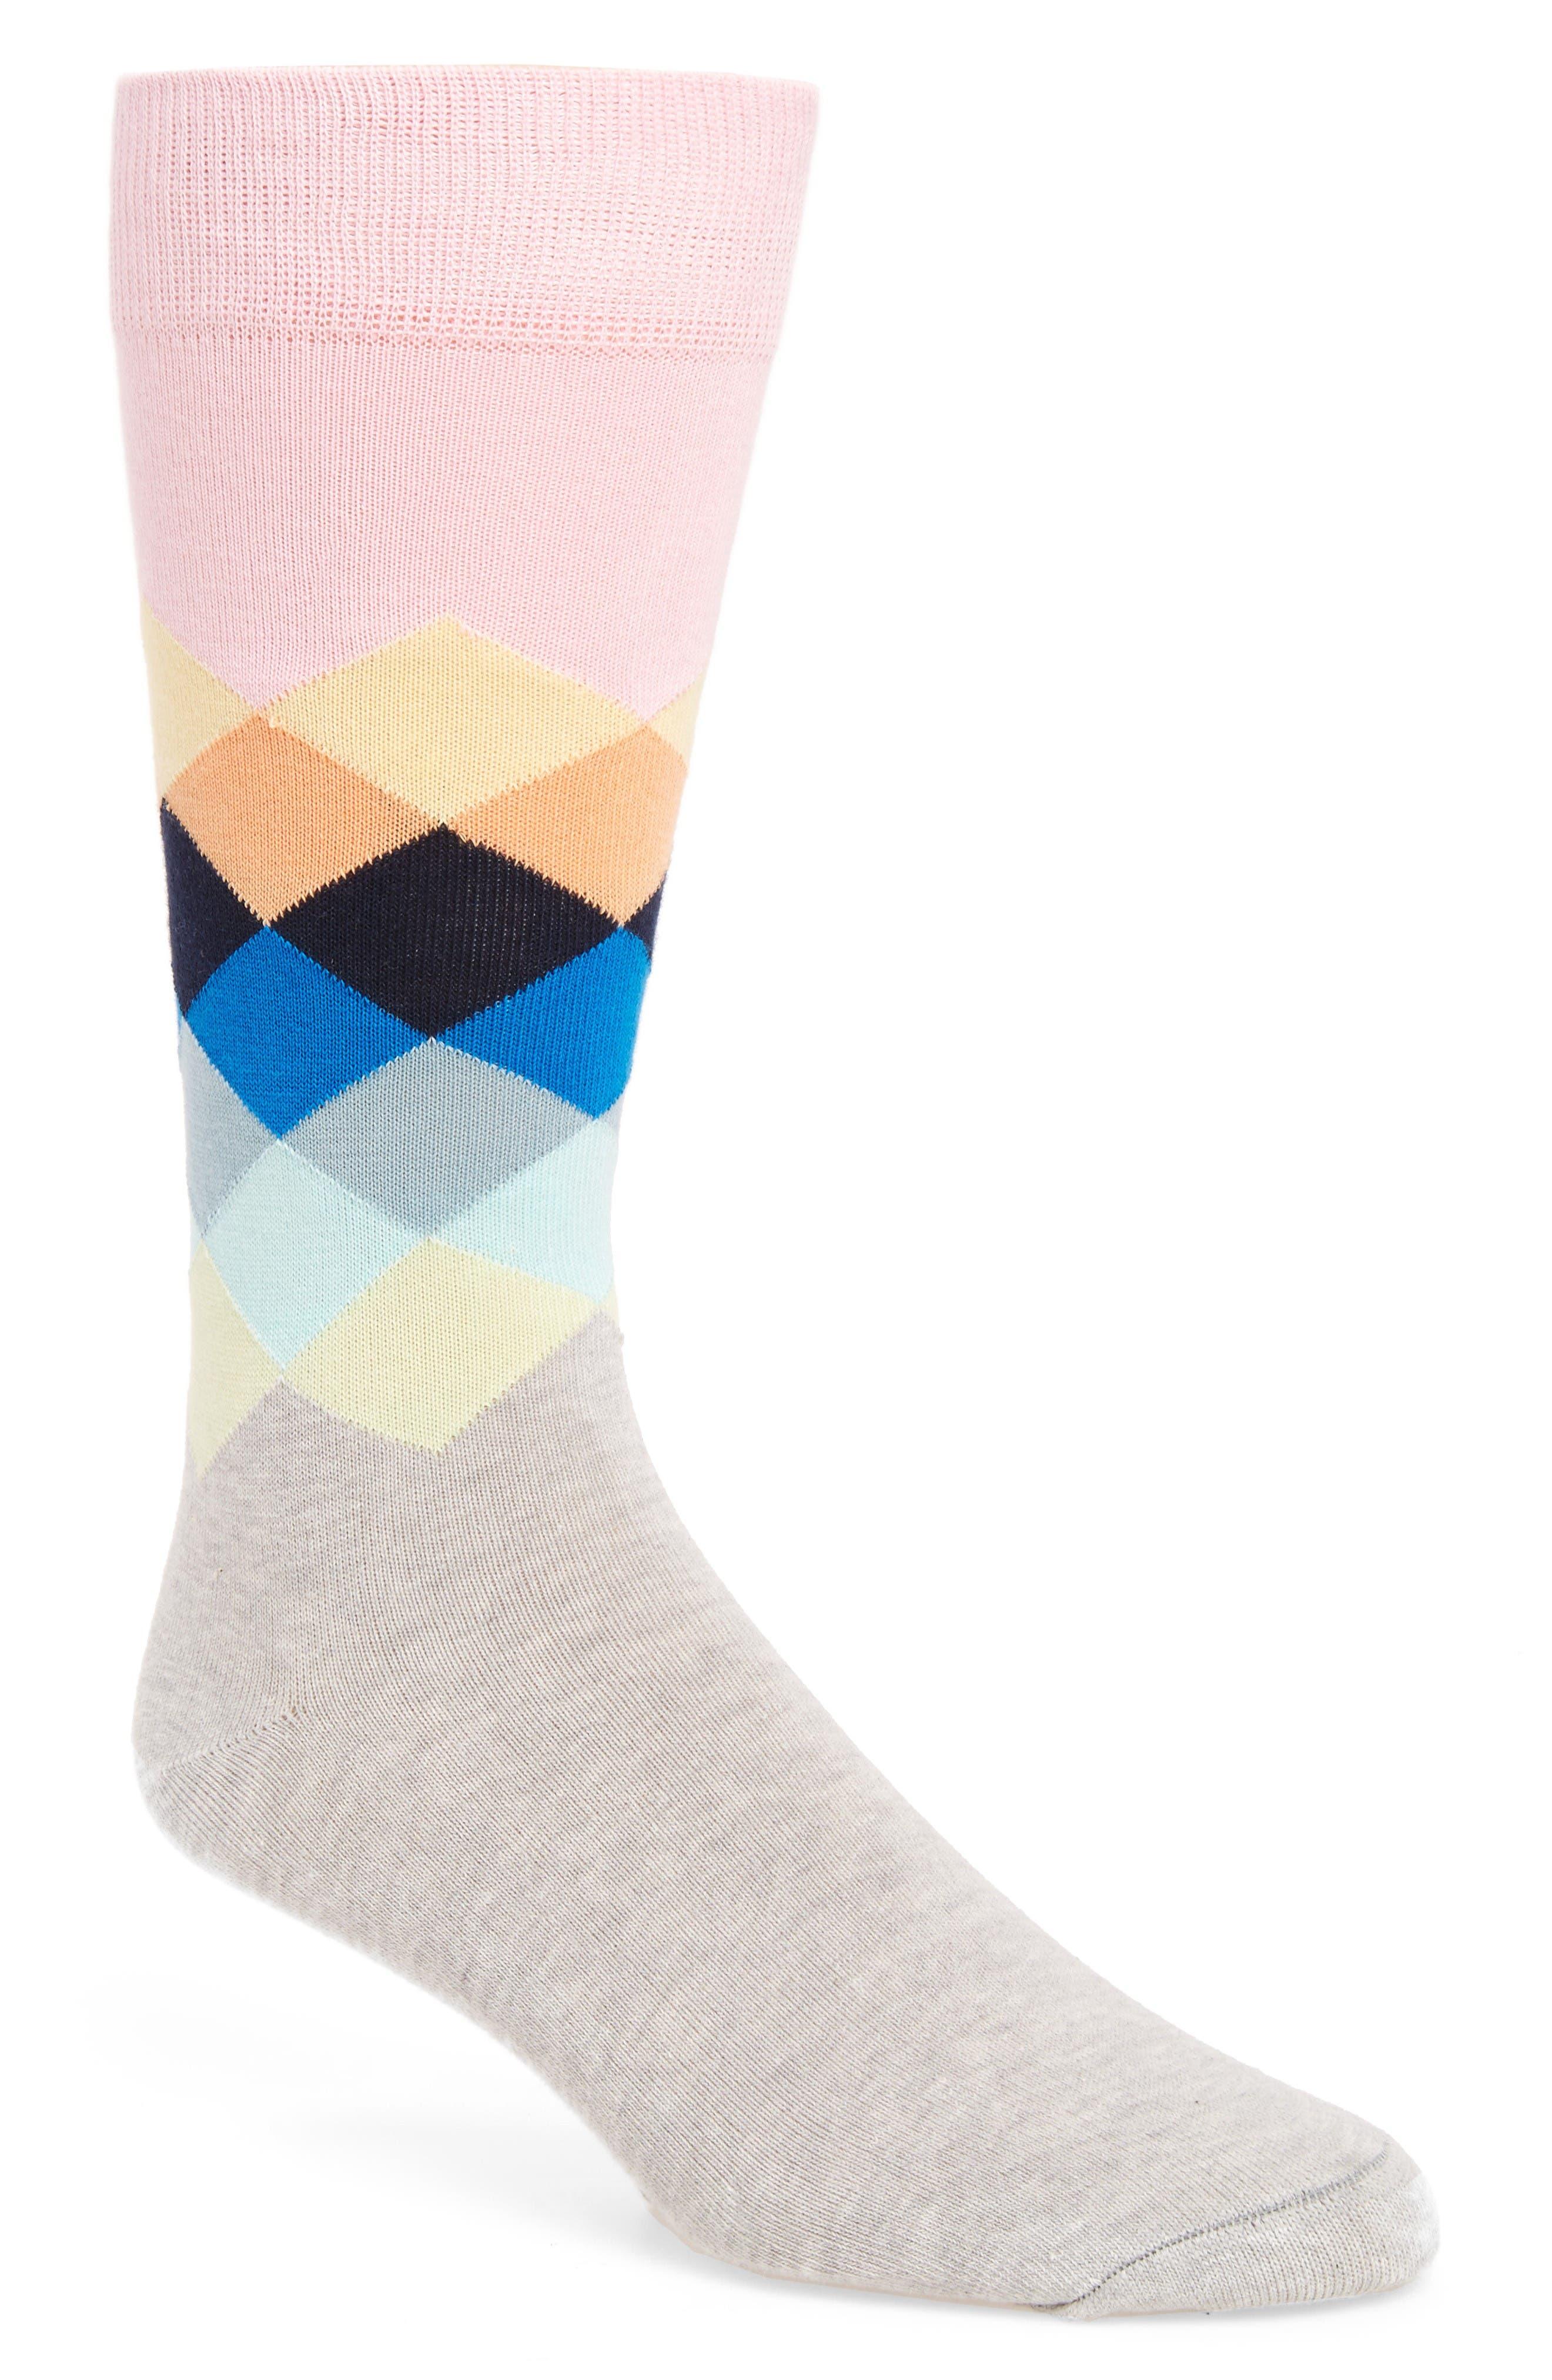 Diamond Socks,                         Main,                         color, Pastel Pink/ Blue